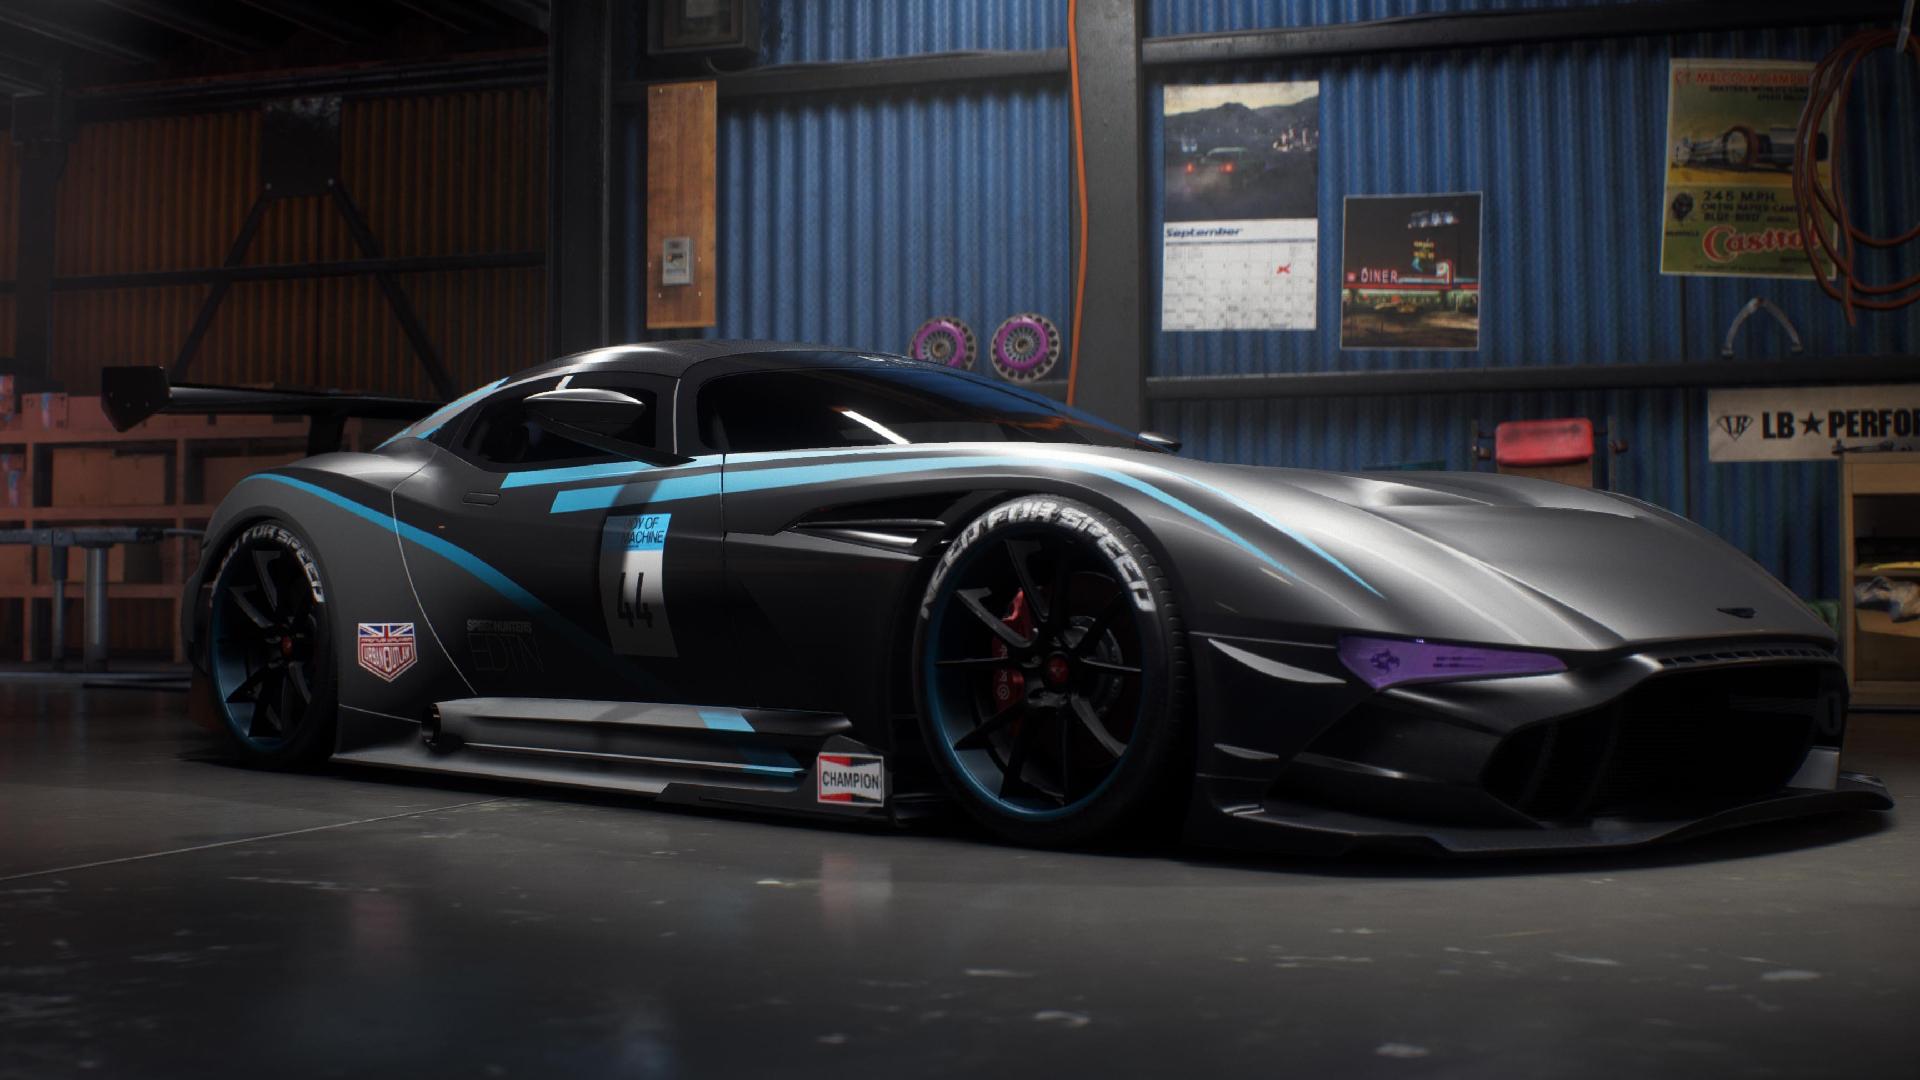 Aston Martin Vulcan Need For Speed Wiki Fandom Powered By Wikia